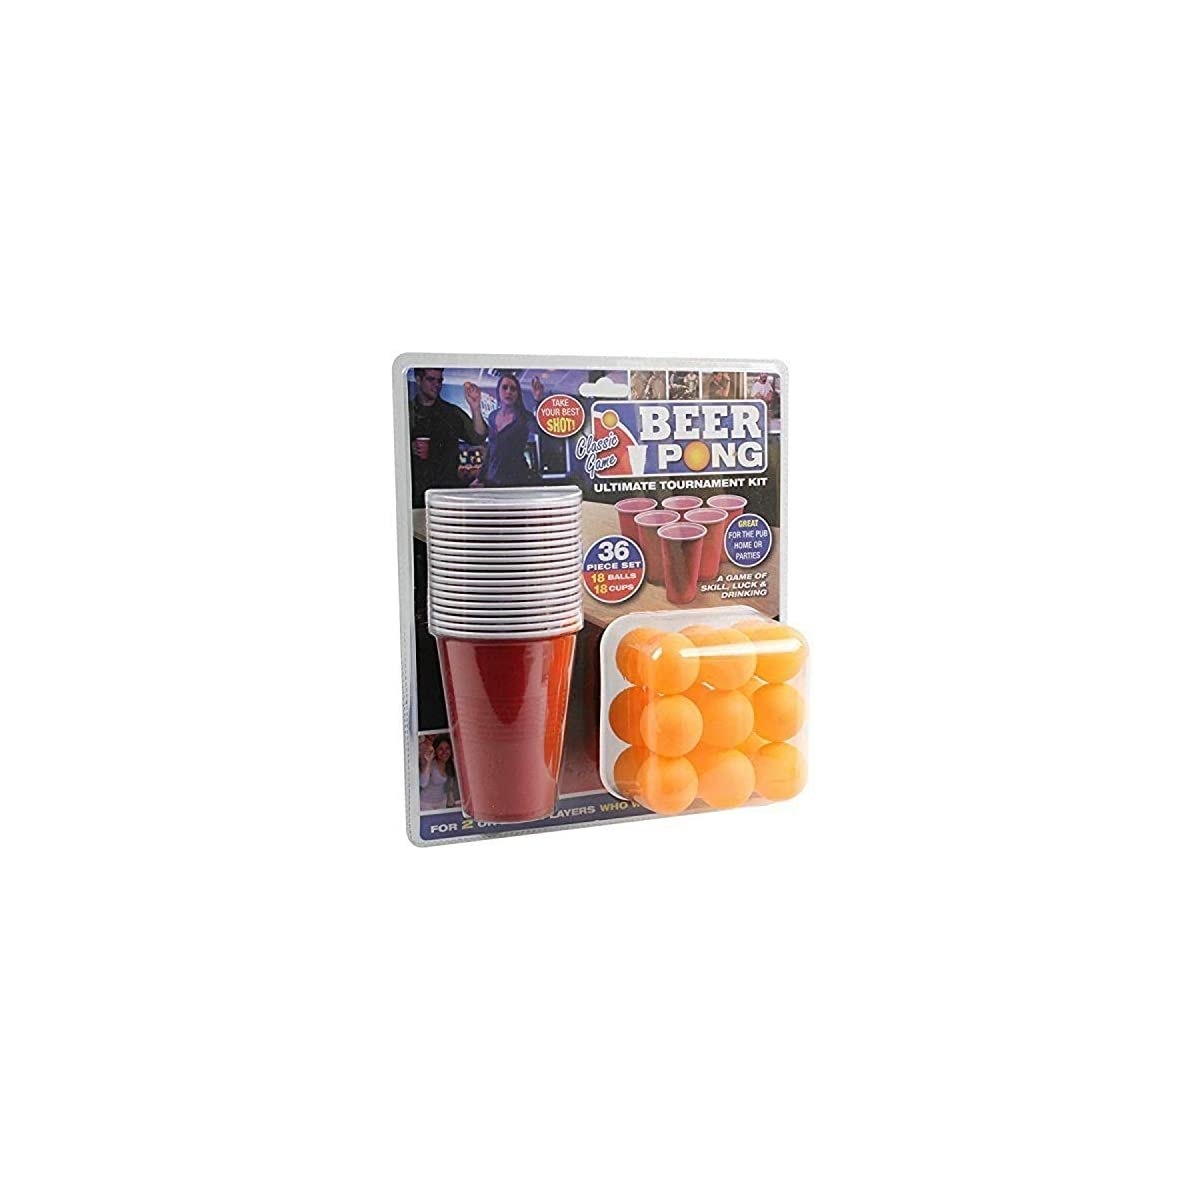 beer pong gift idea